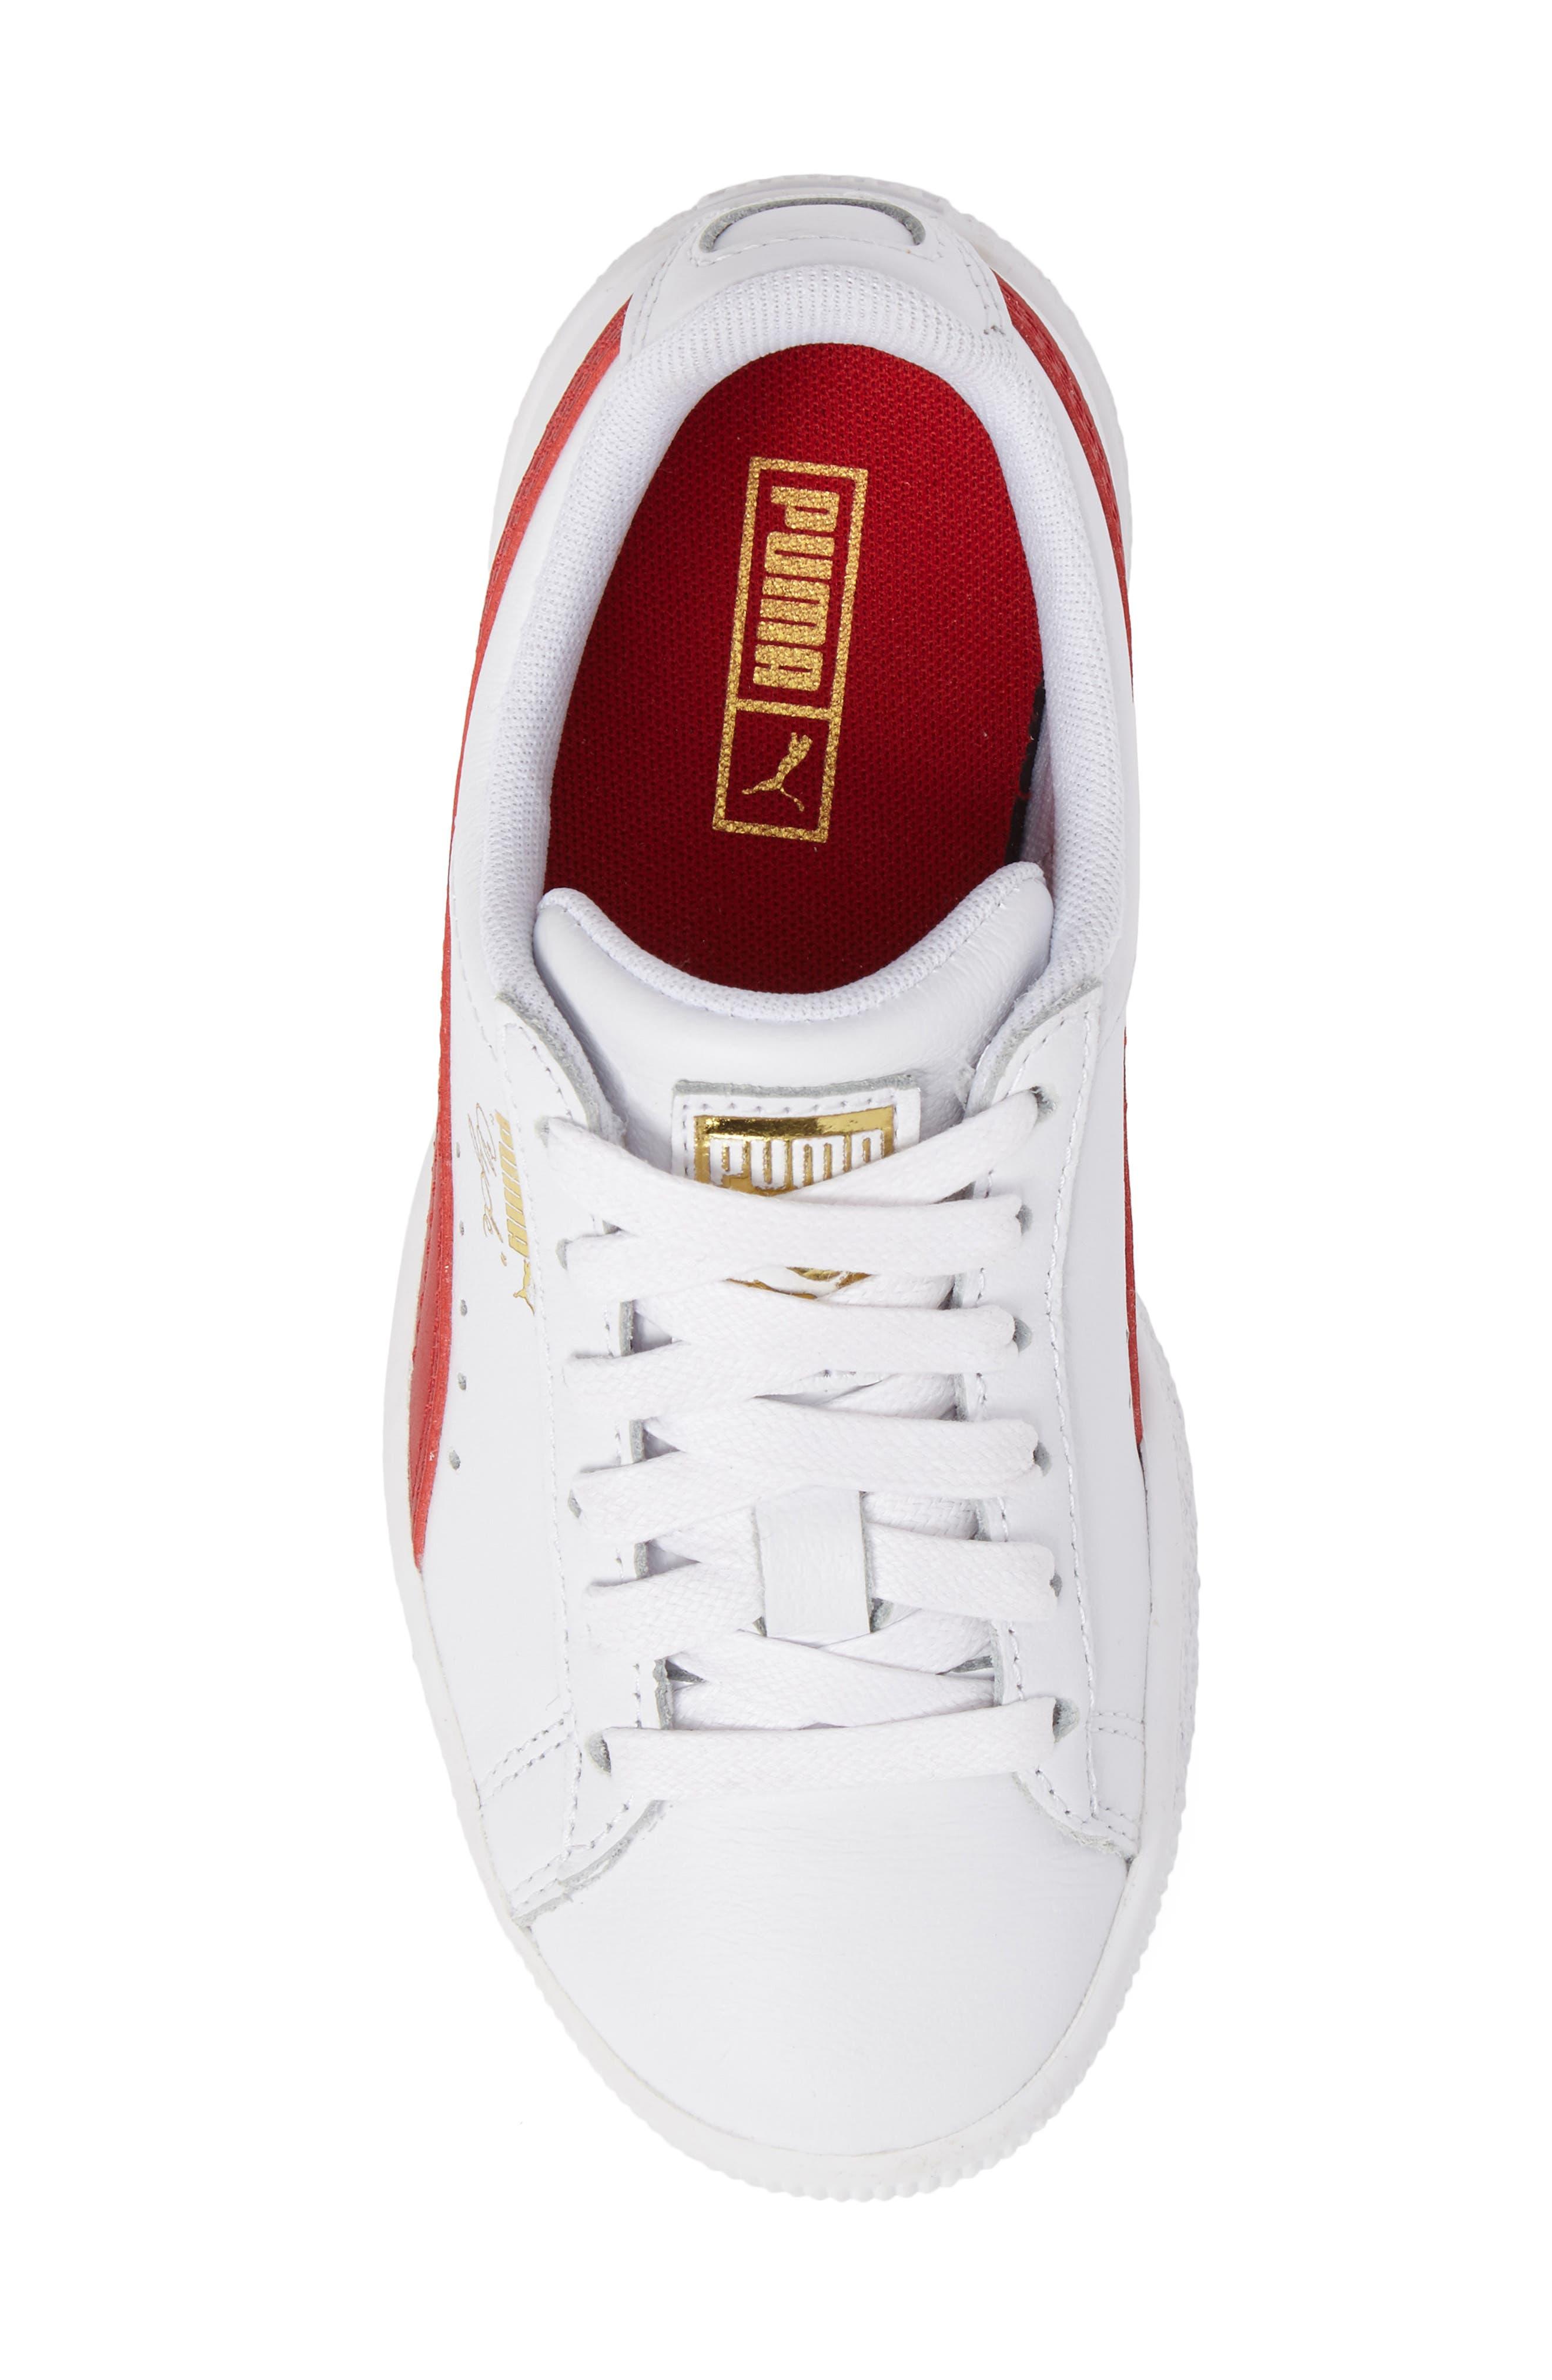 Clyde Core Foil Sneaker,                             Alternate thumbnail 5, color,                             White/ Cherry